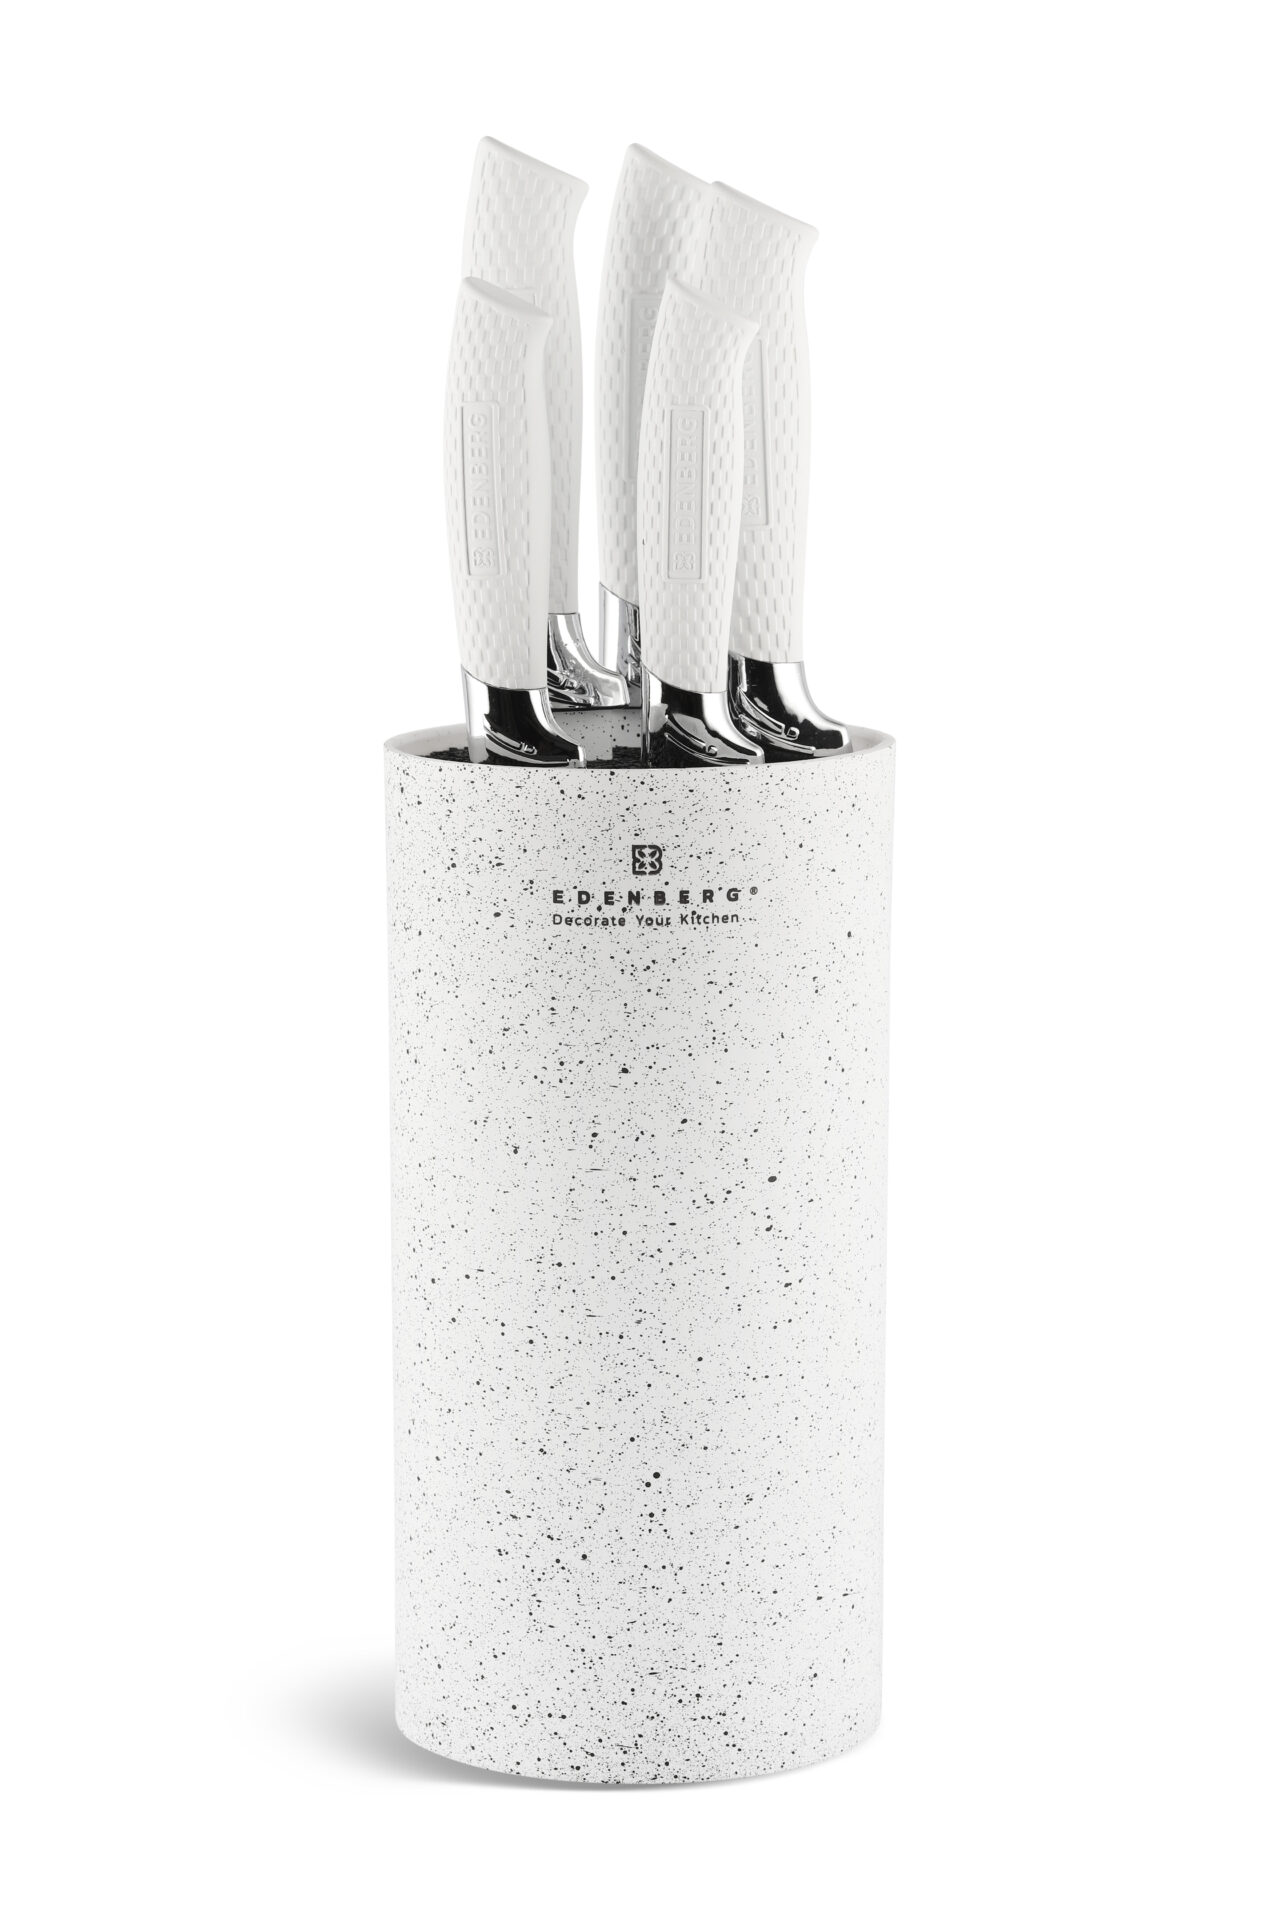 Edenberg EB-5103 Sada nožů v bloku 6 ks bílá